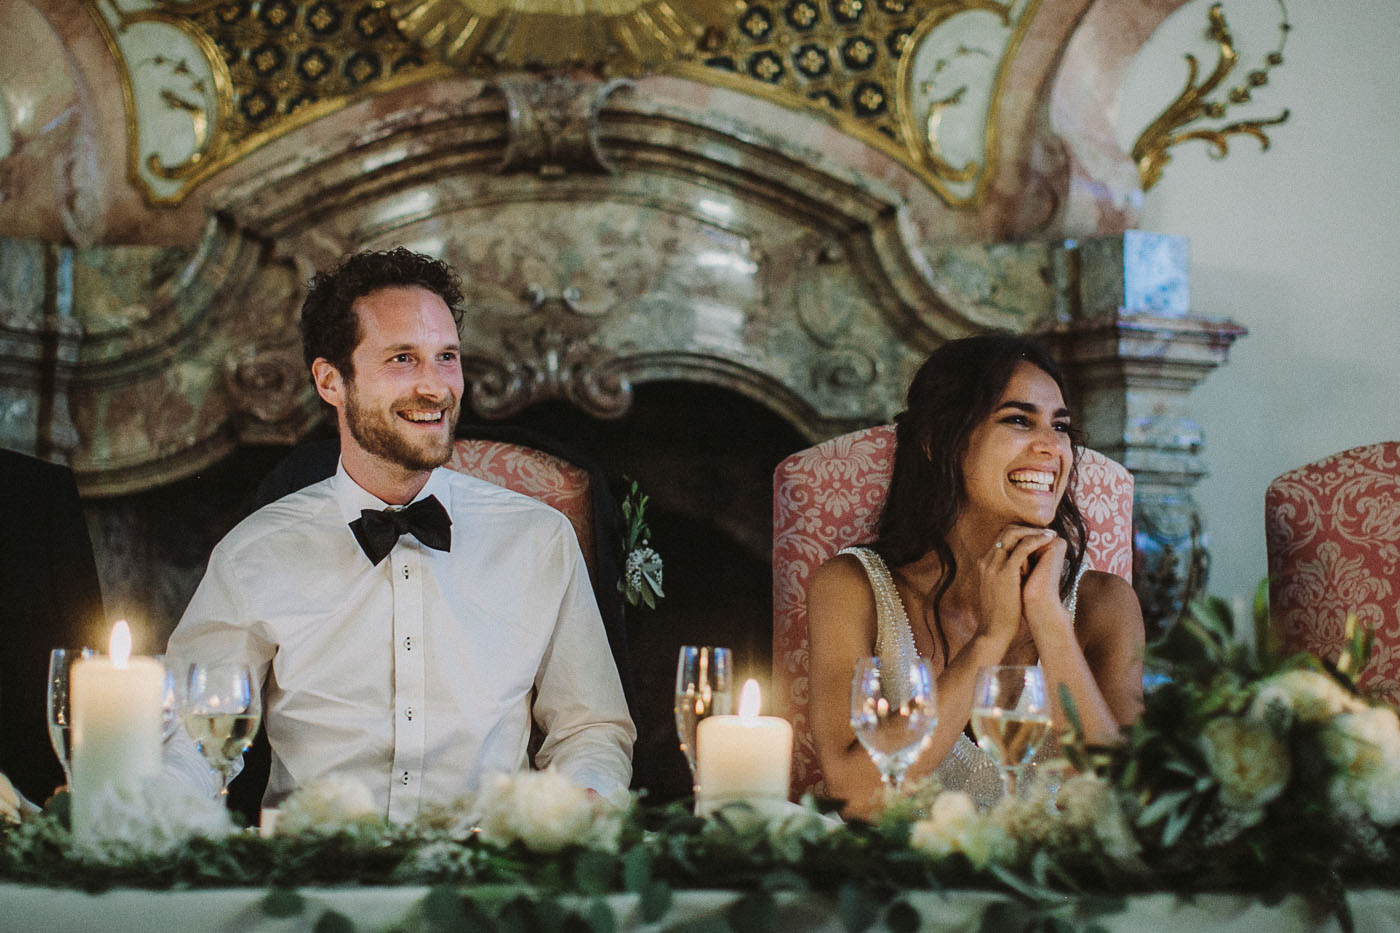 wedding-leopoldskron-photographer-64